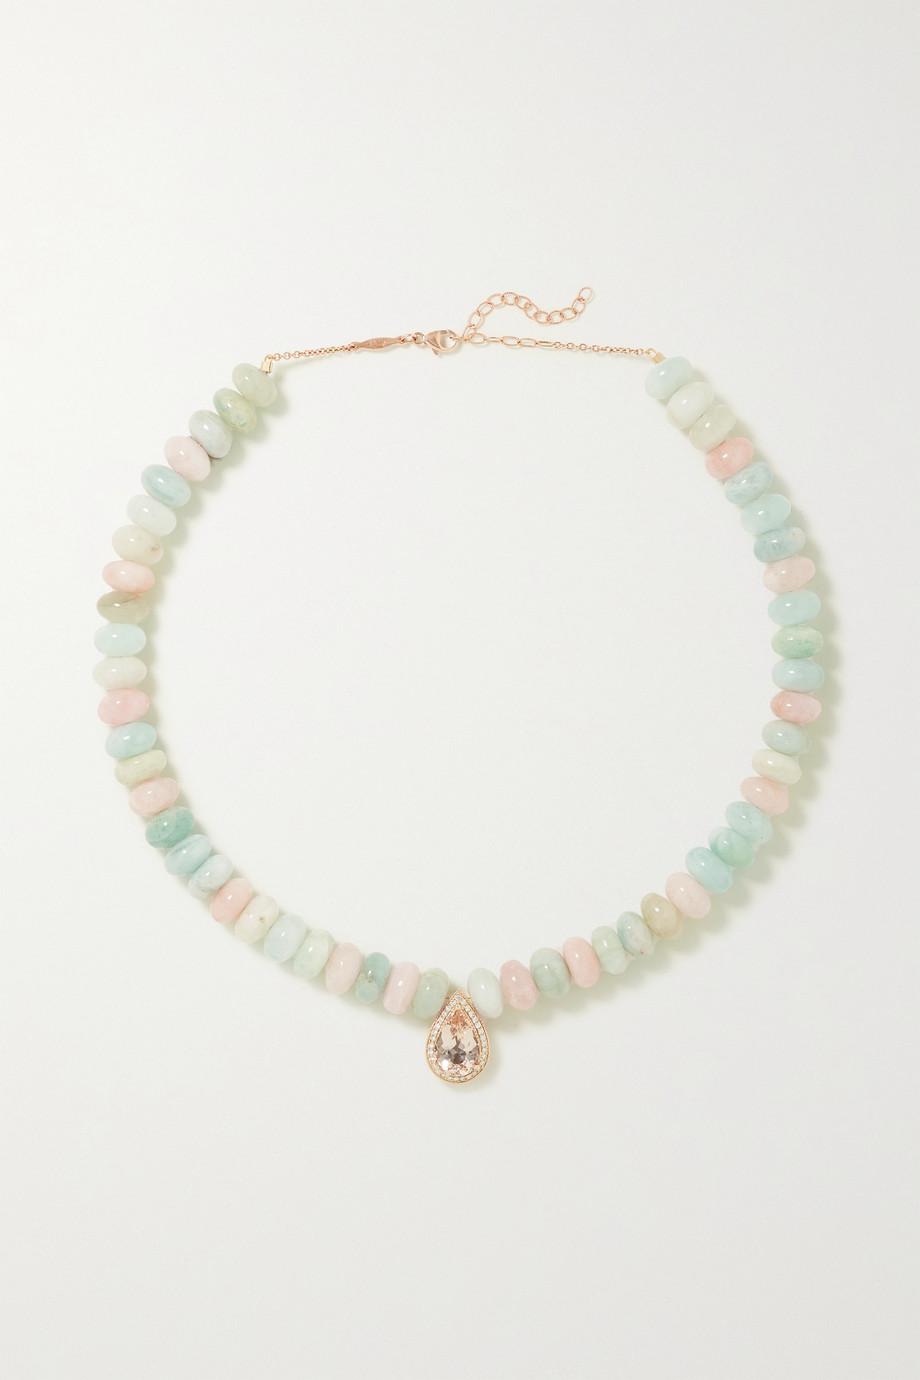 Jacquie Aiche 14-karat rose gold multi-stone necklace